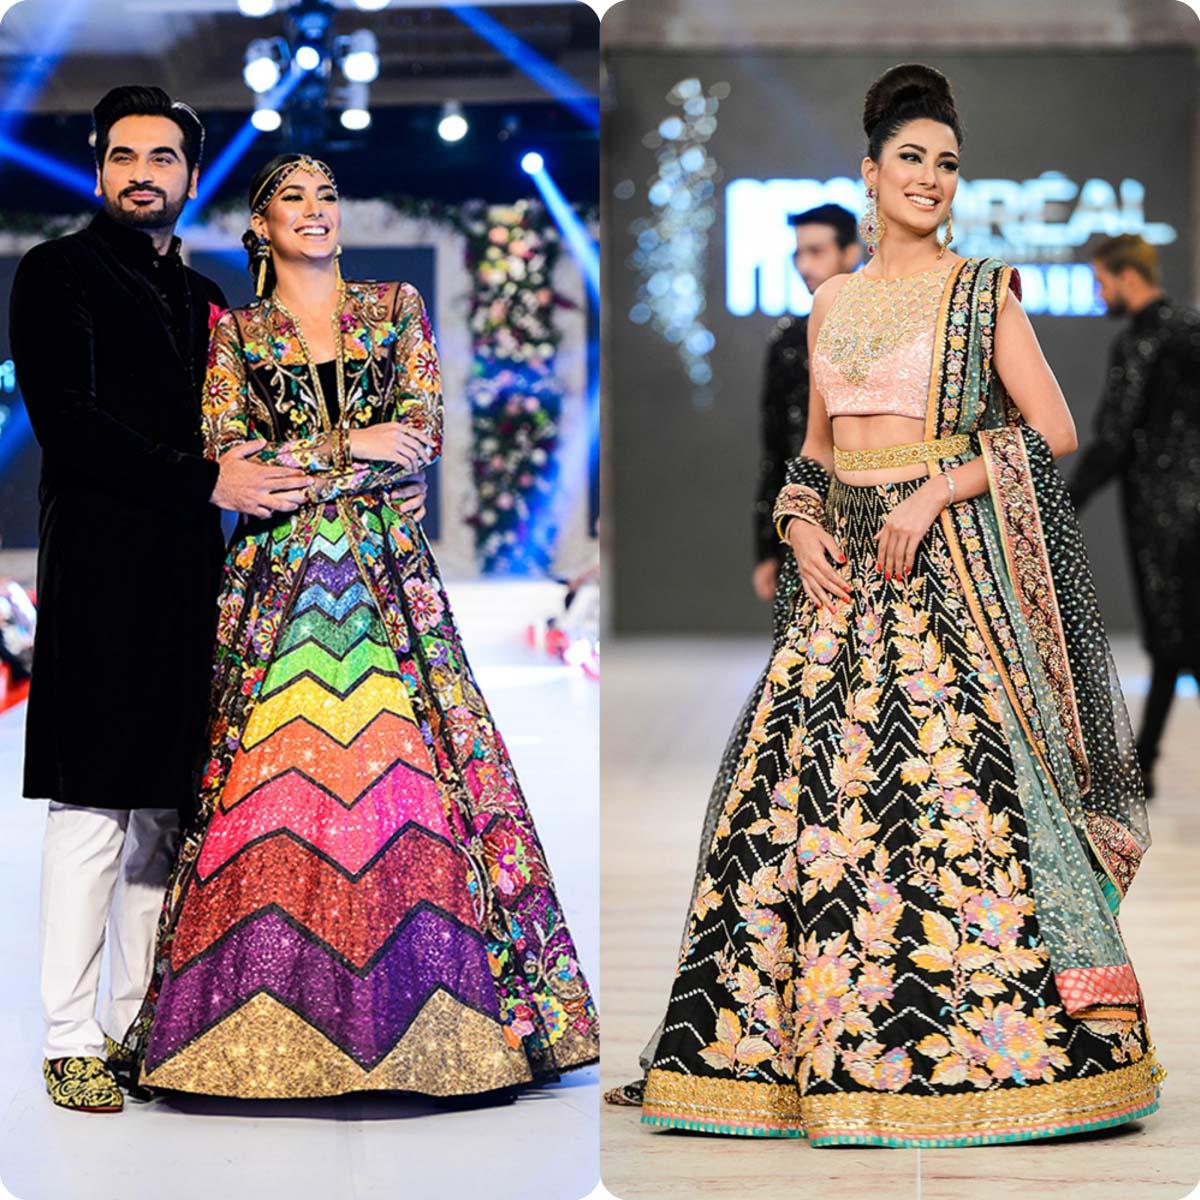 Nomi Ansari Bridal Wear Collection Ft-Junaid Khan & Maya Ali 2016-17 (1)